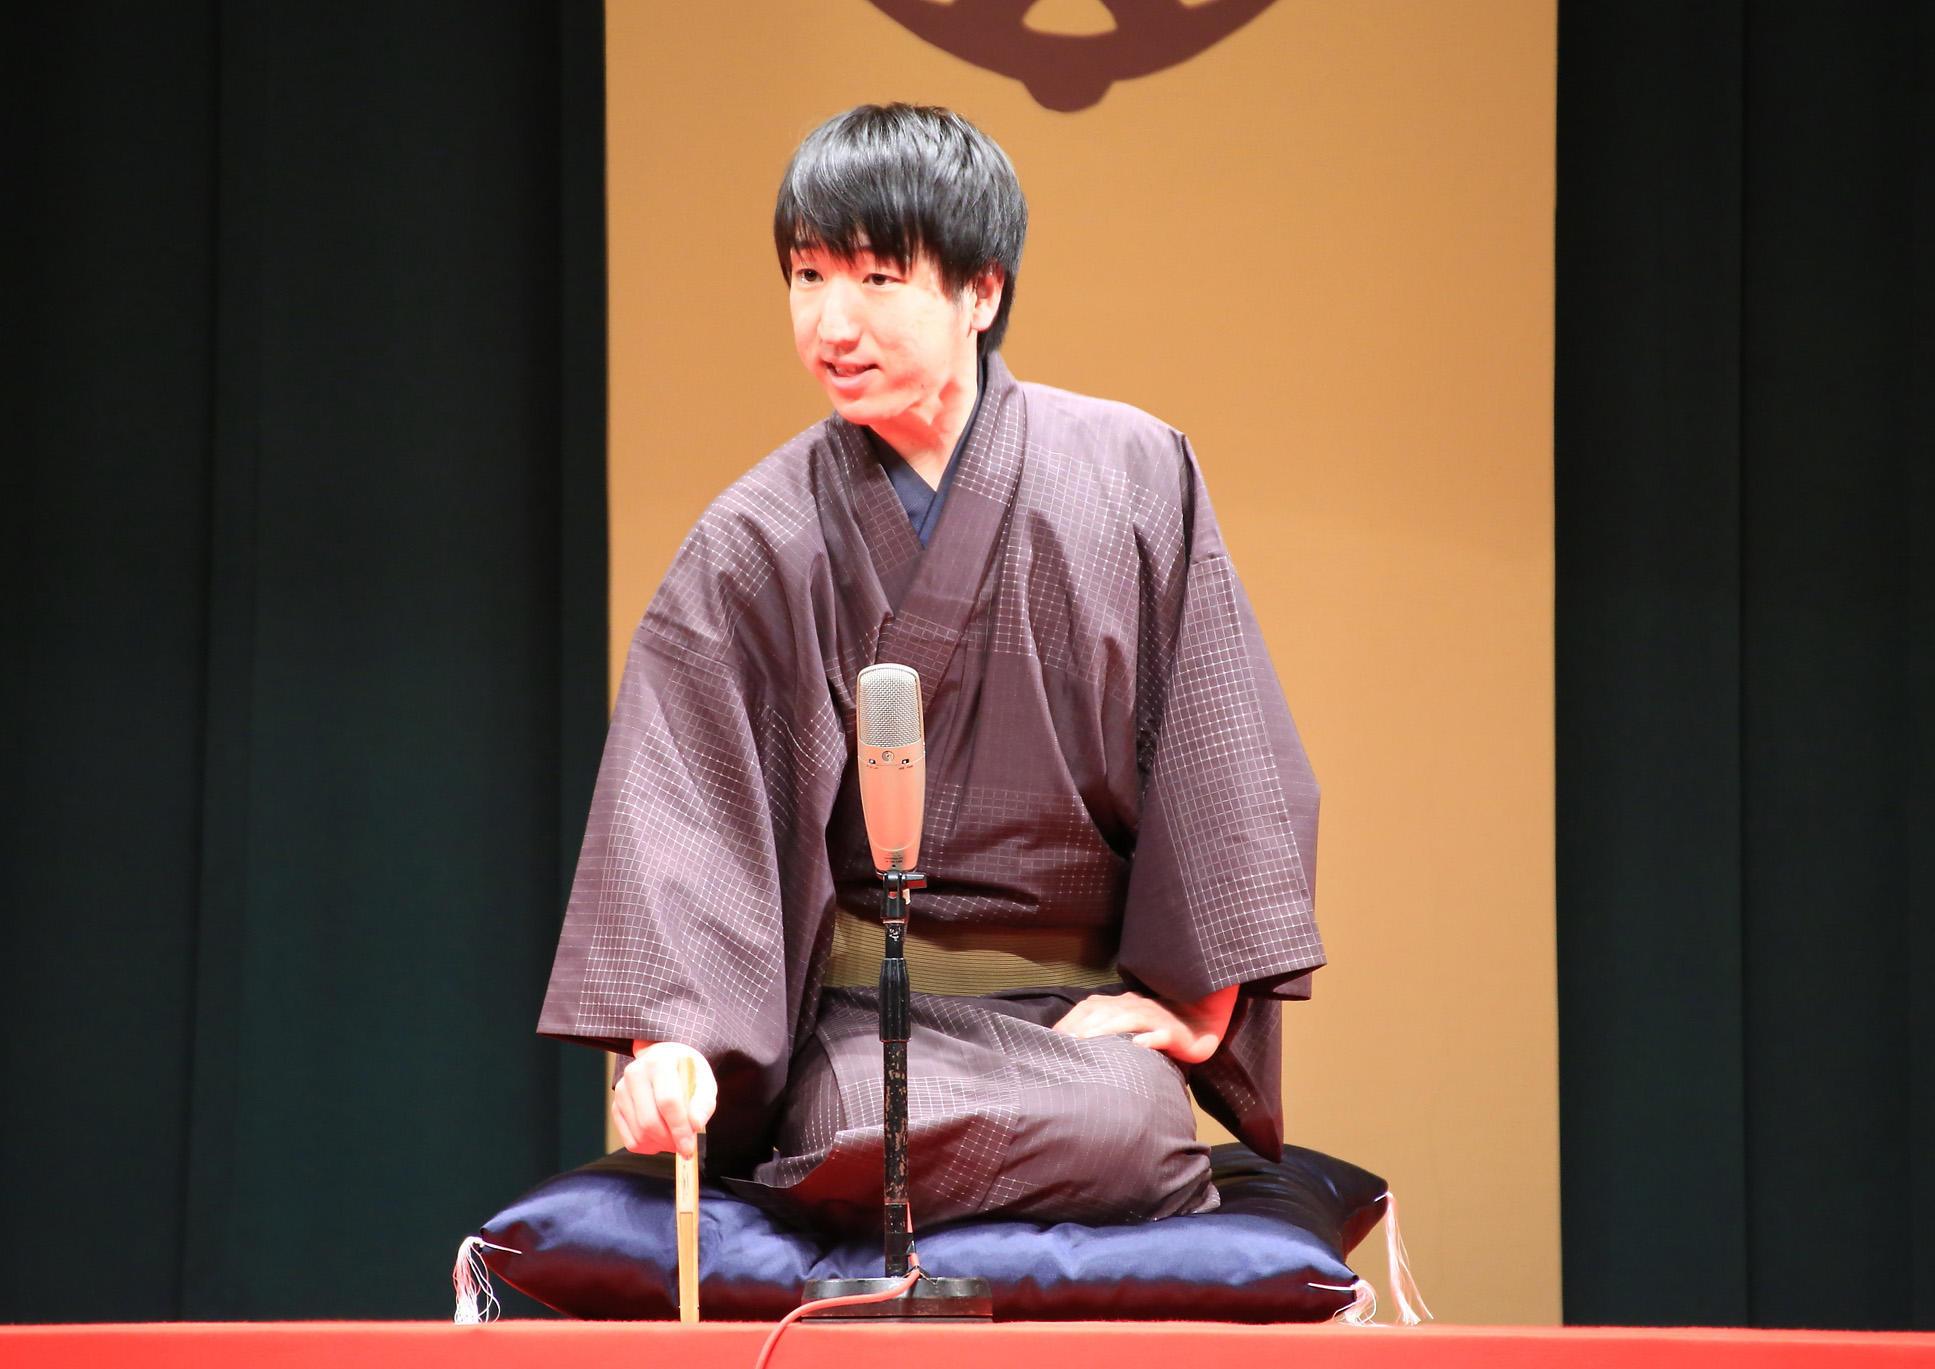 http://news.yoshimoto.co.jp/20190130181433-09a745d8fa481169fccf46738ea49bc58dee0c2d.jpg